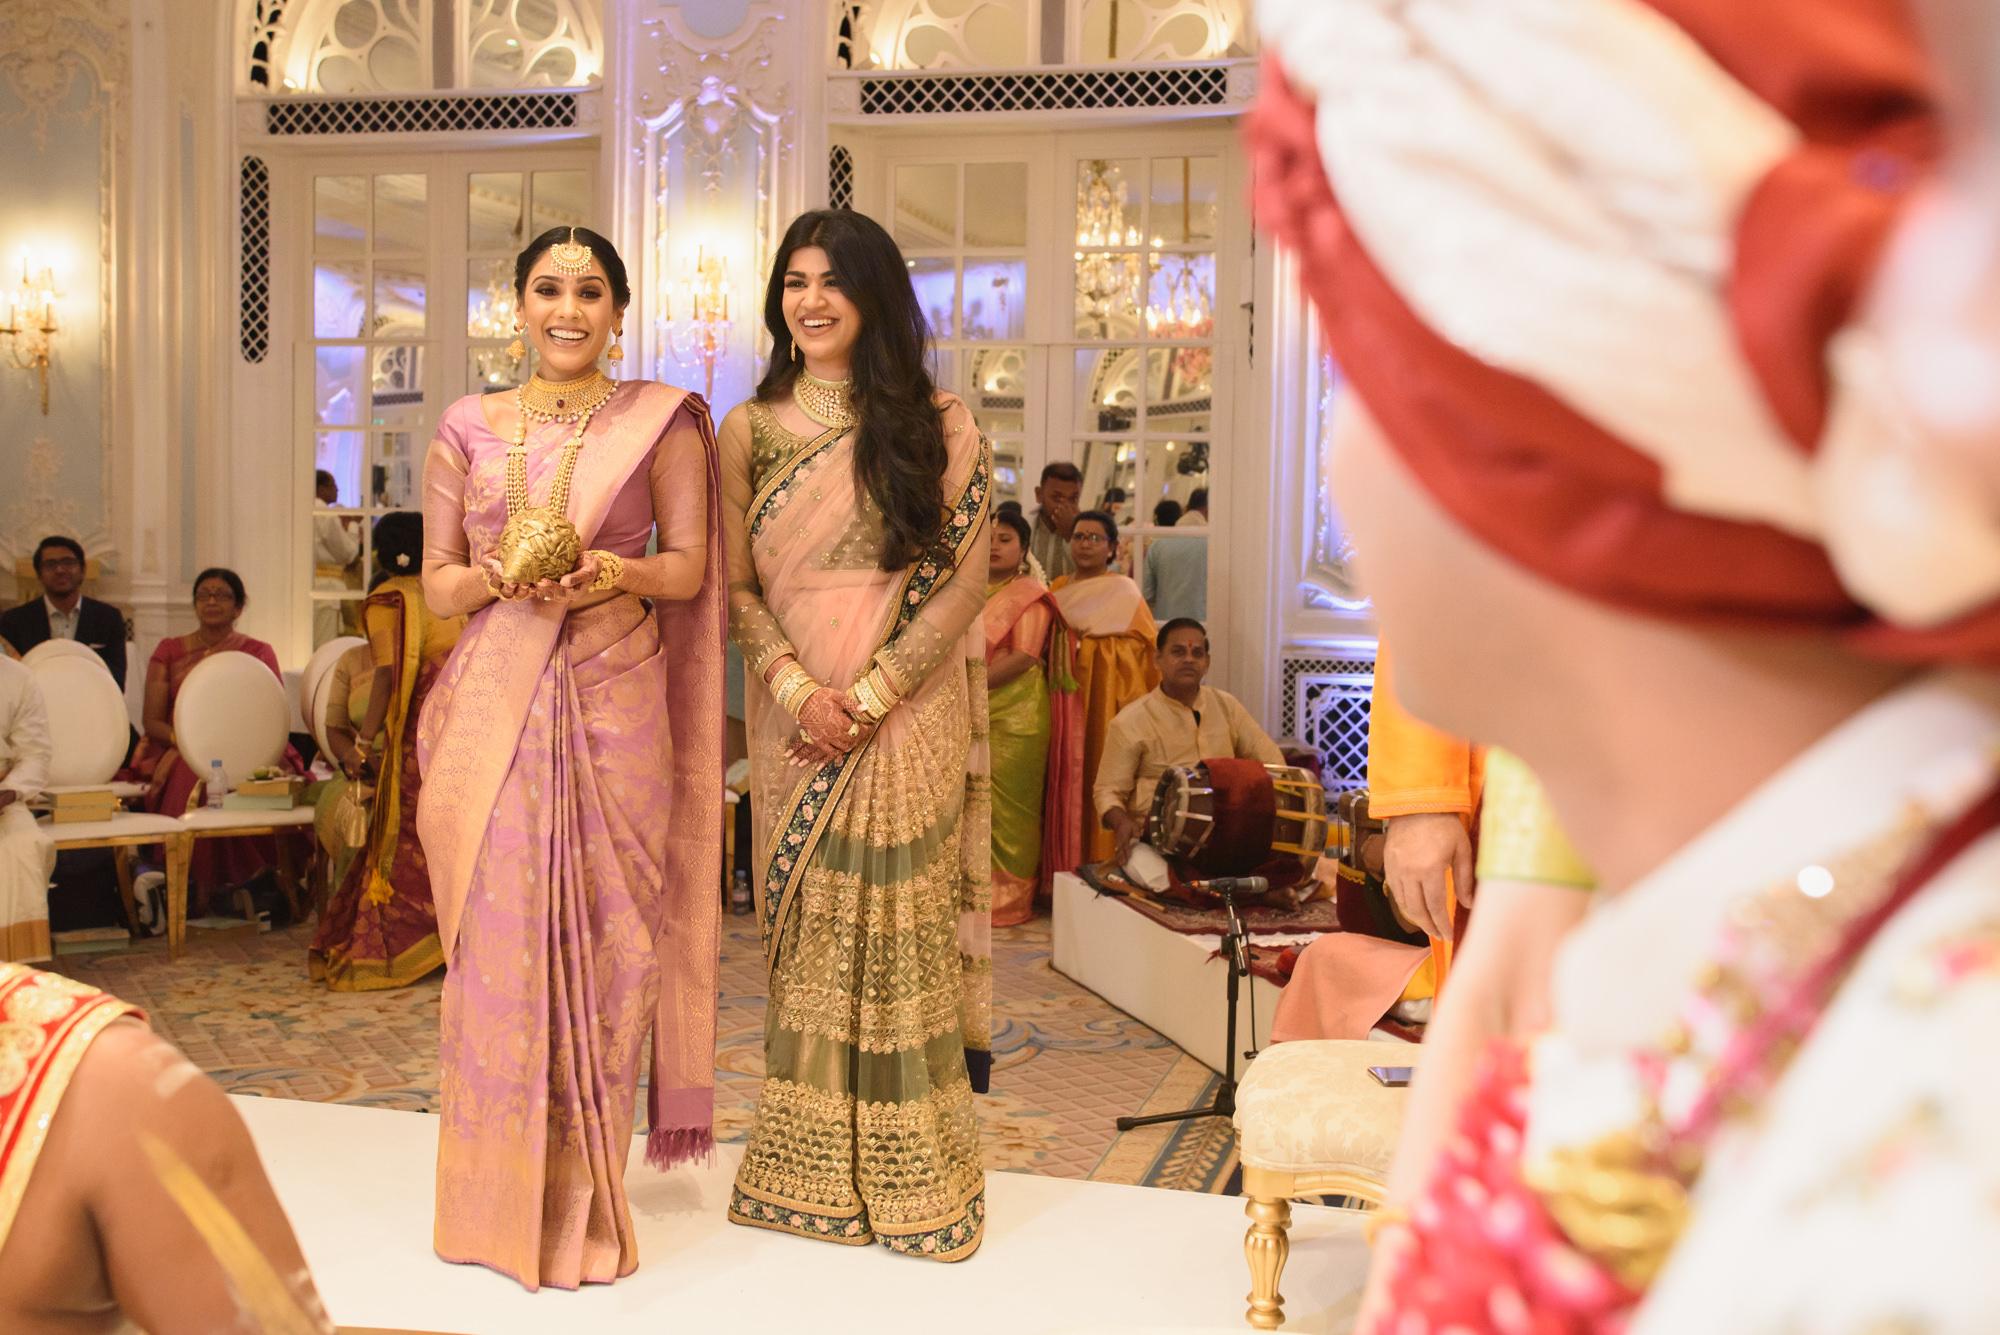 Tamil Gujrati hindu wedding photography photographer london the savoy -40.jpg